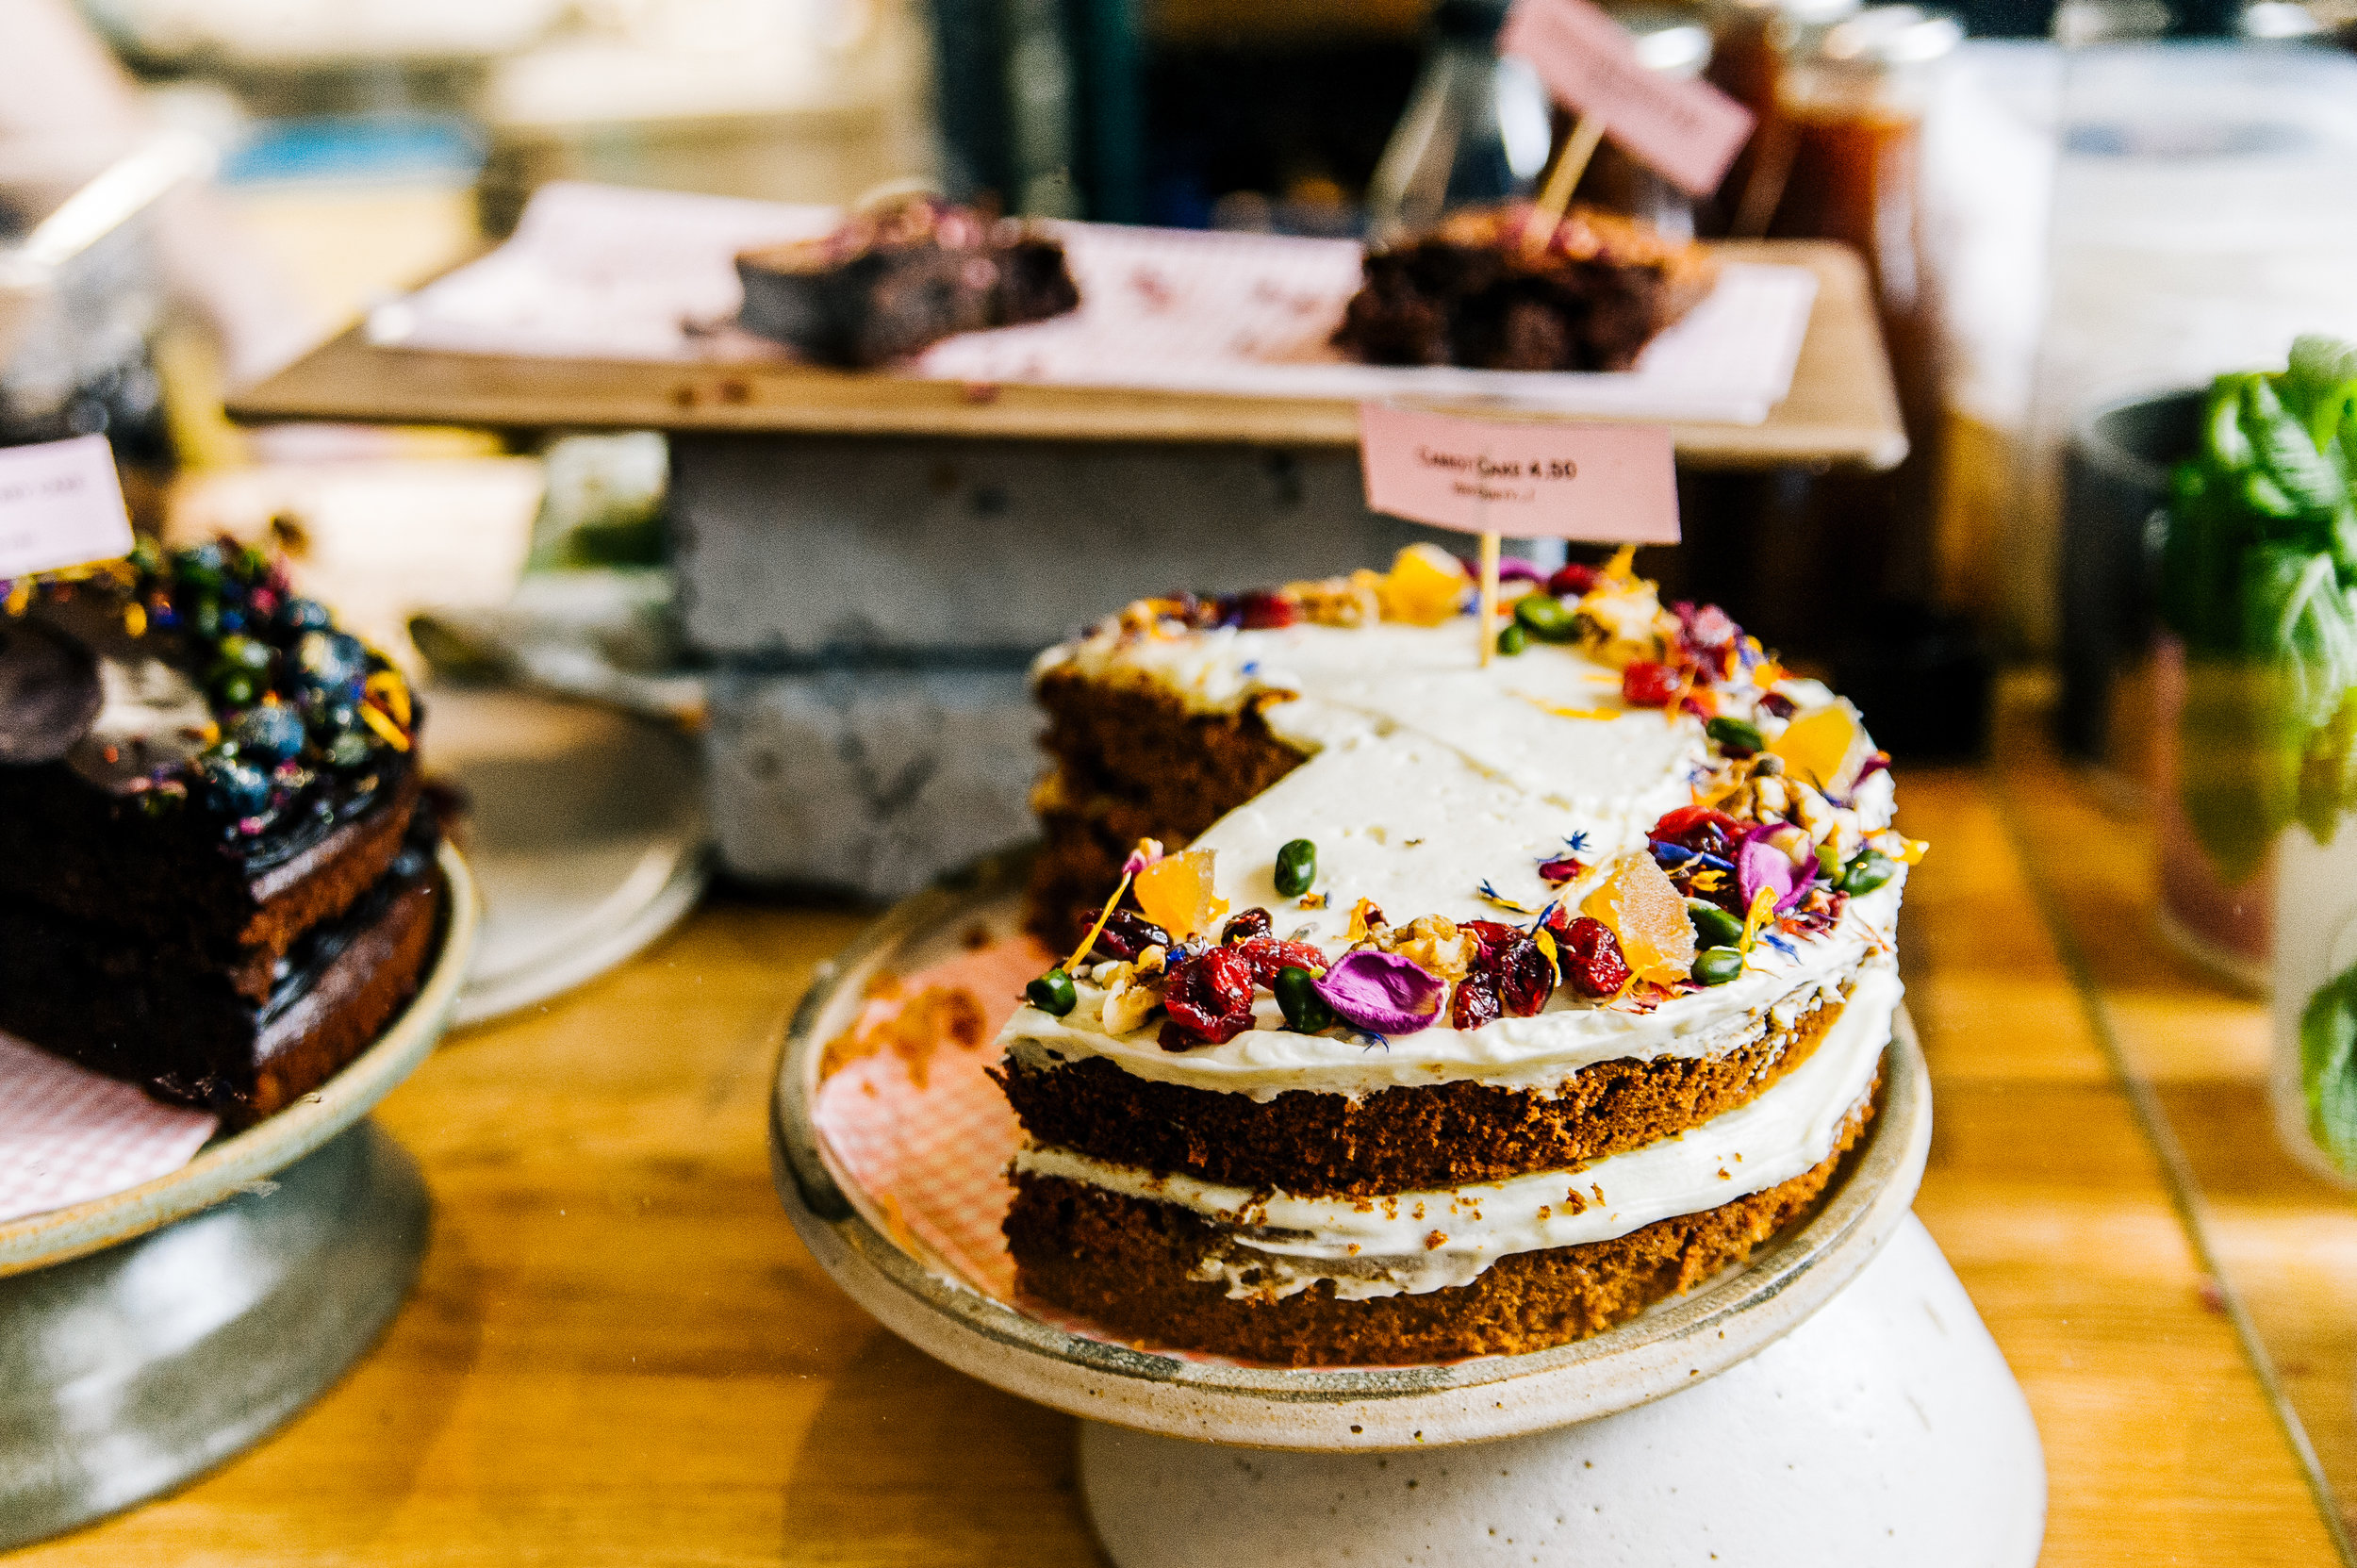 cake tasting wedding events healthy eating